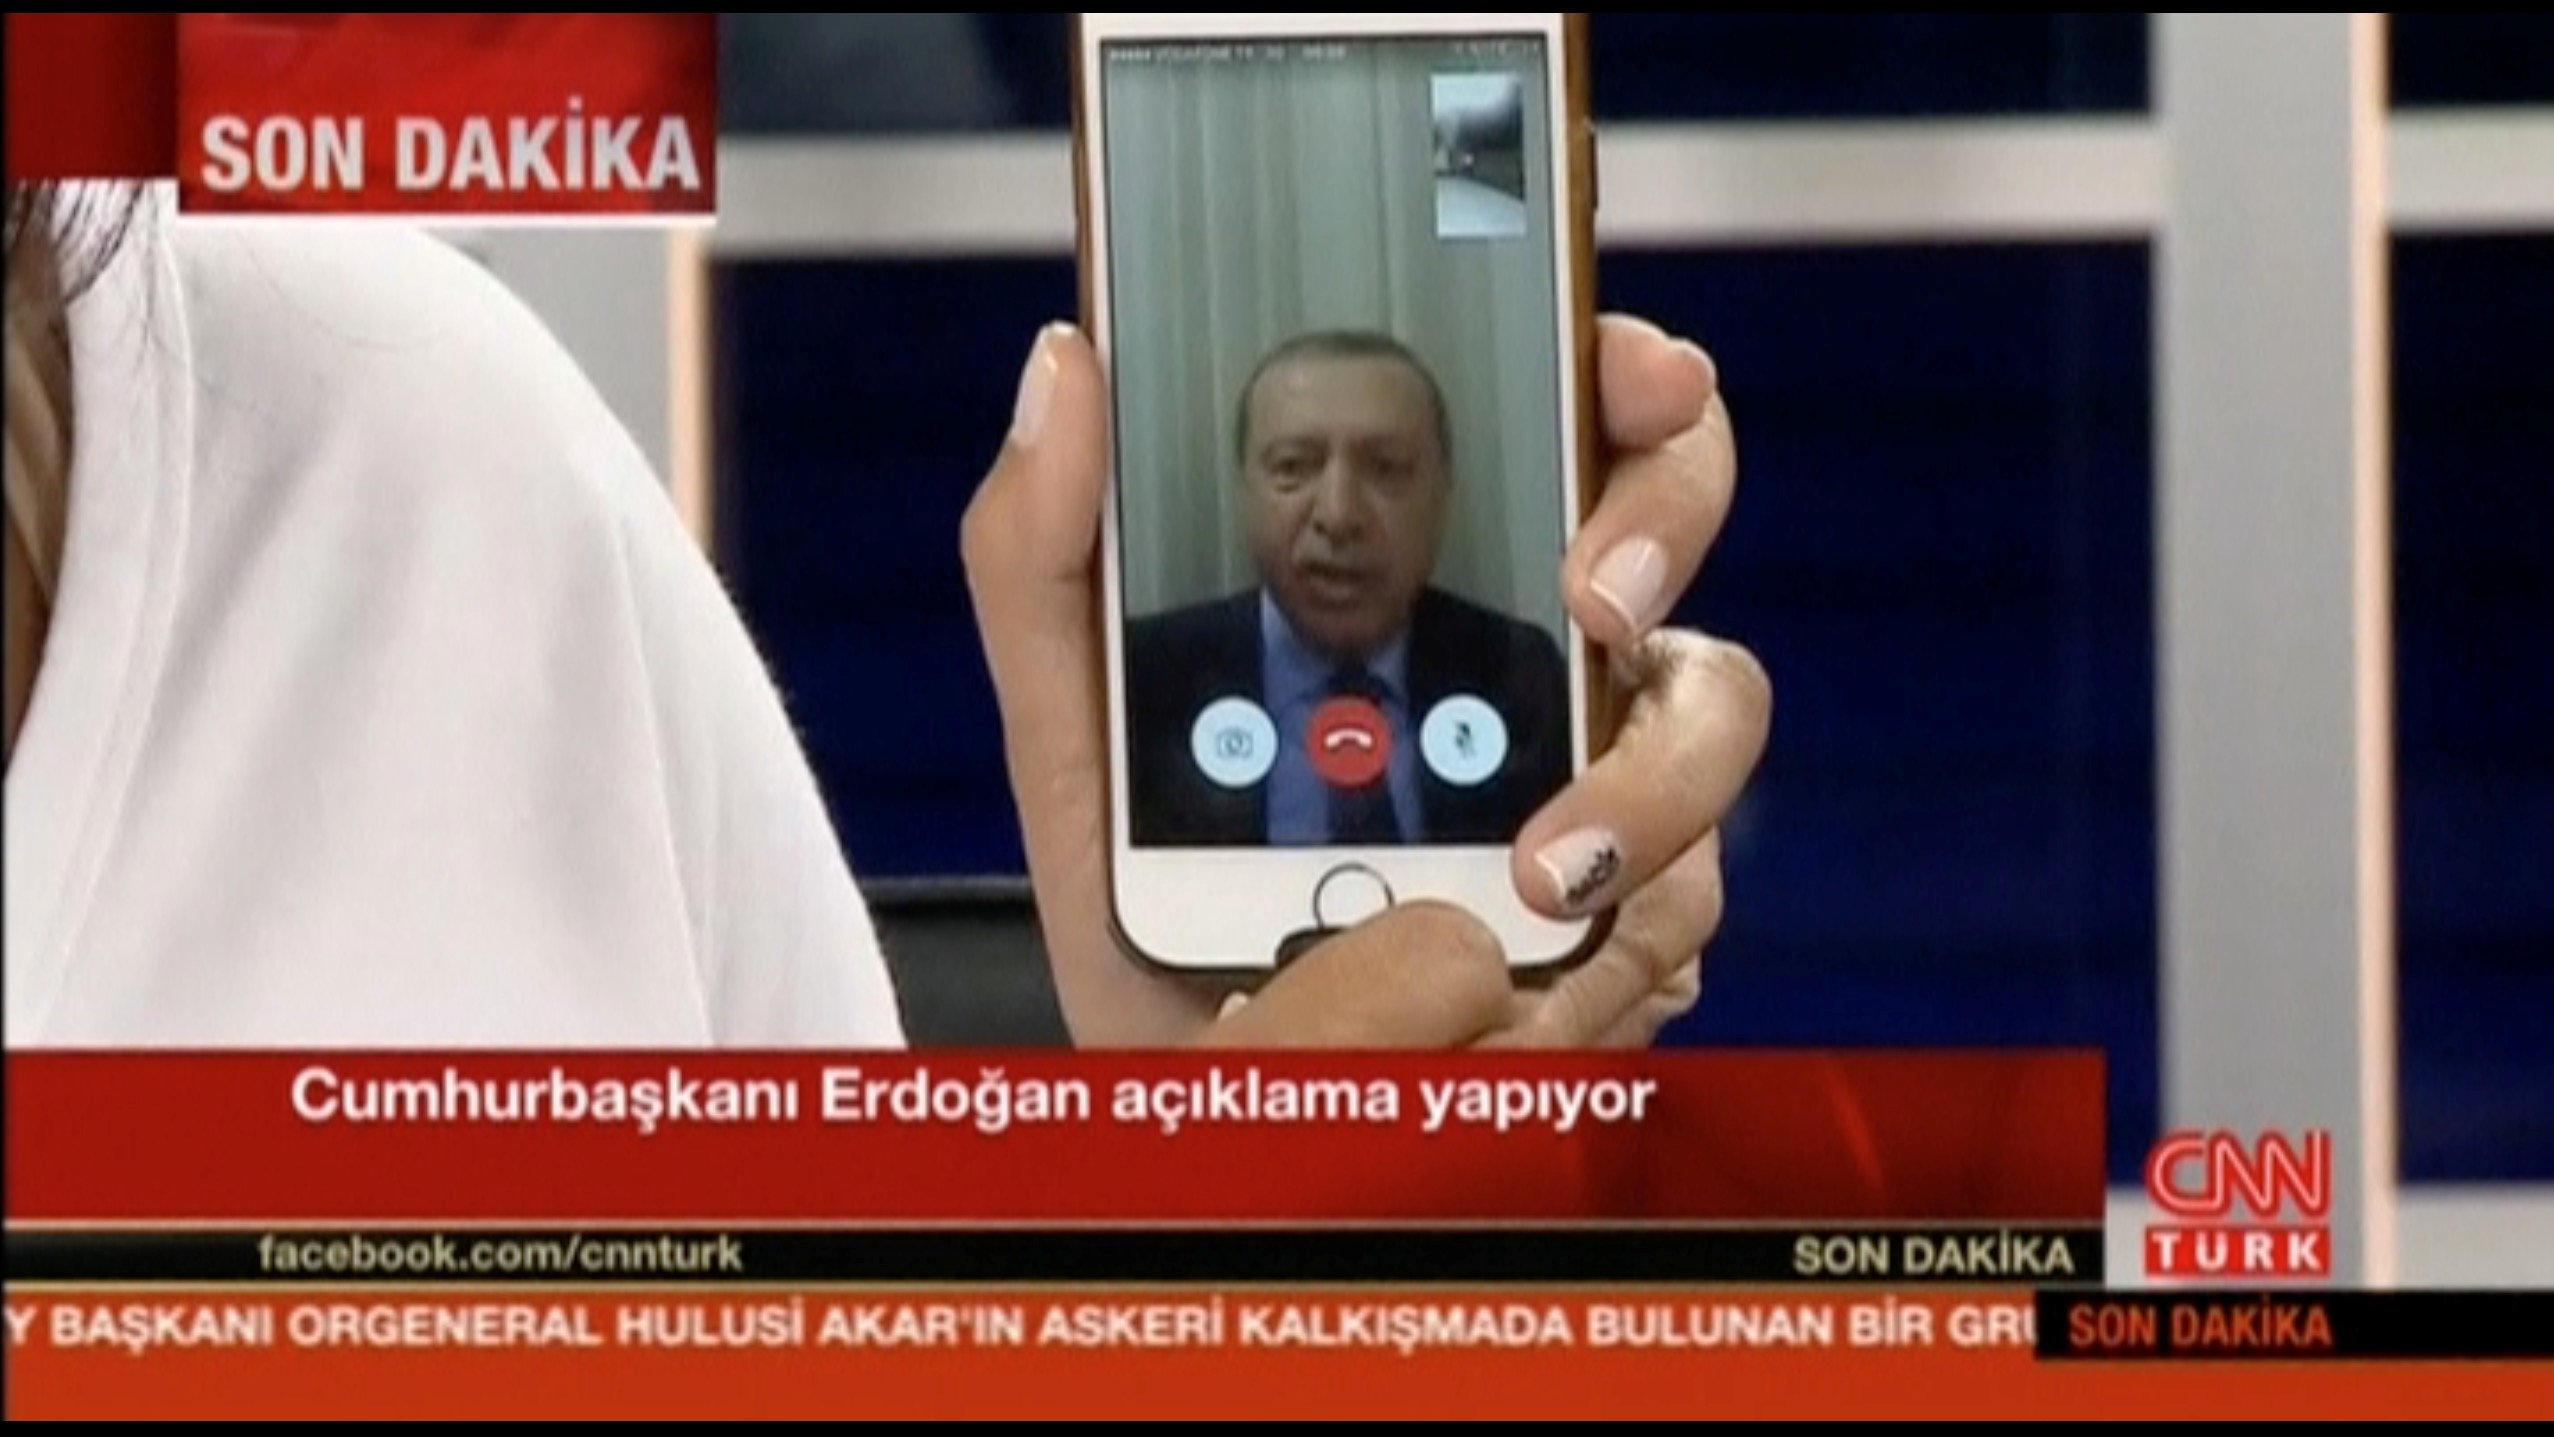 2016 07 16T023148Z 386872040 S1AETPVEXWAA RTRMADP 3 TURKEY SECURITY